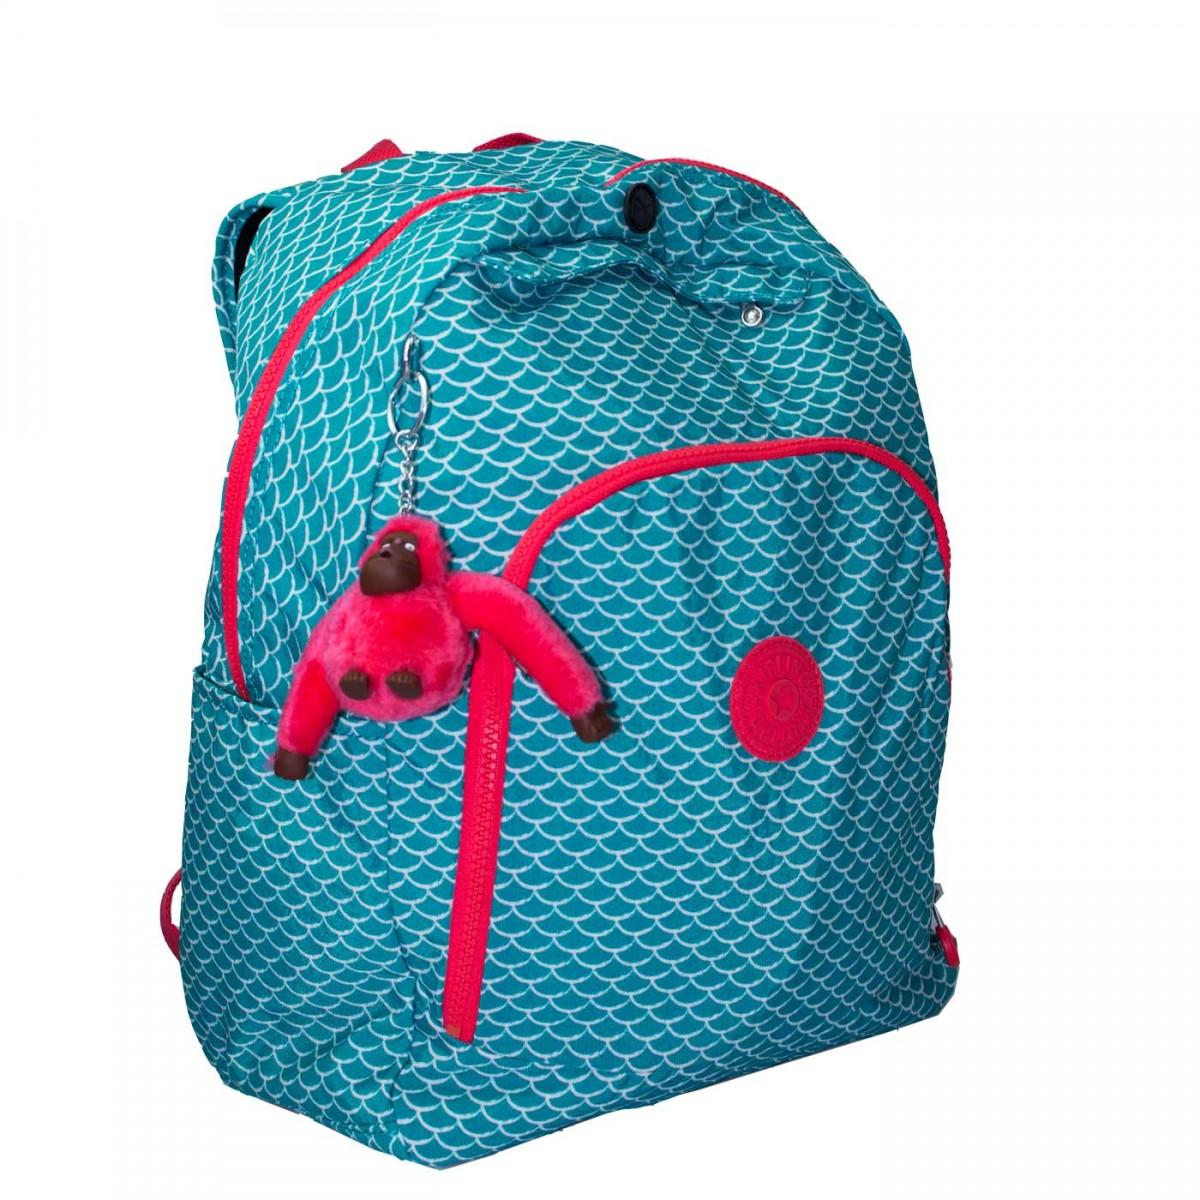 Bizz Store Mochila Feminina Kipling Carmine Grande Pink a73d99fd67b56